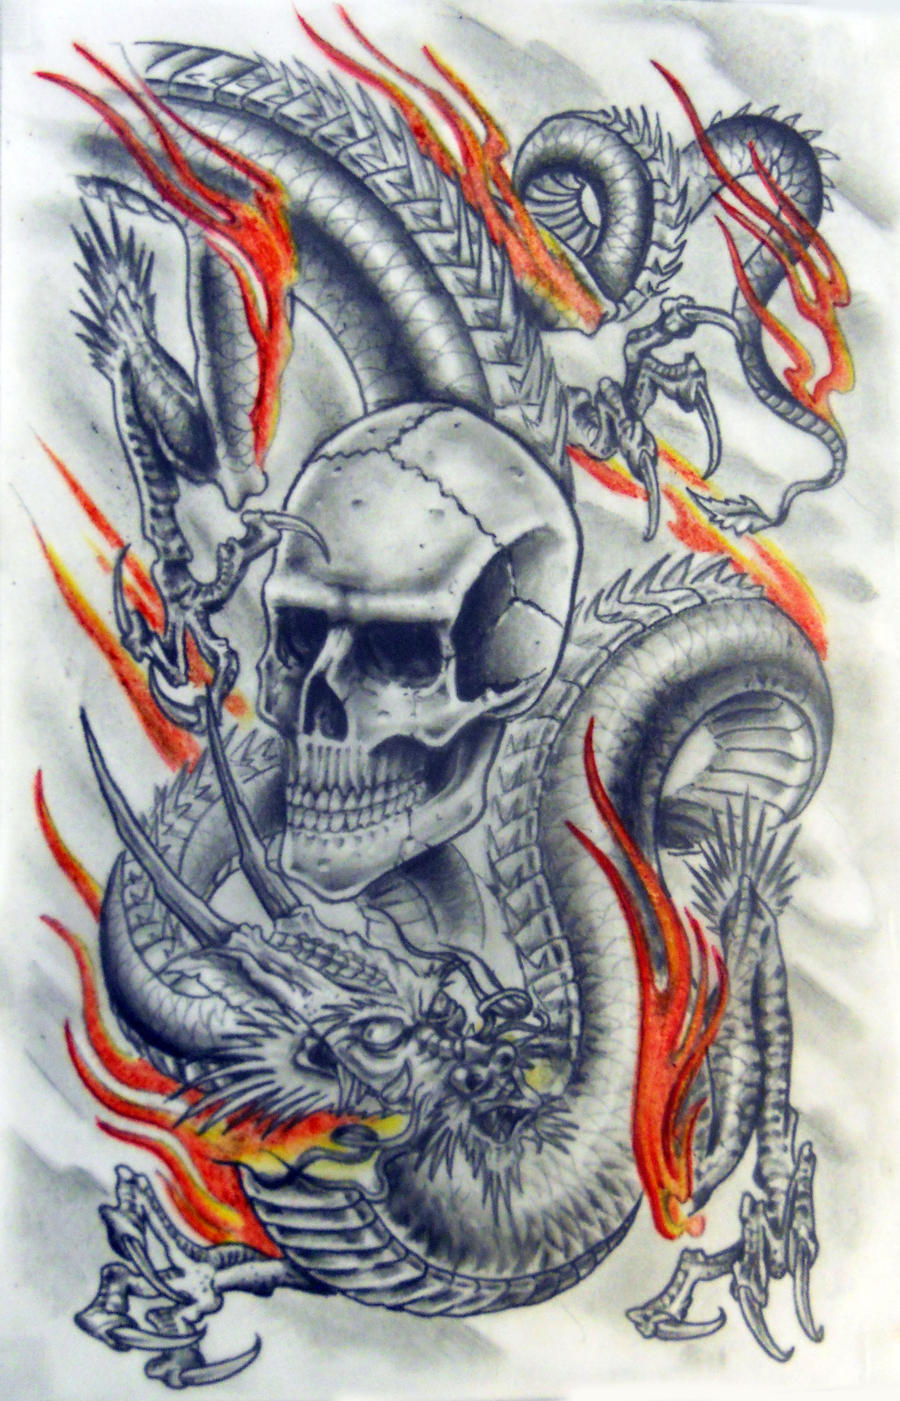 dragon and skull by karlinoboy